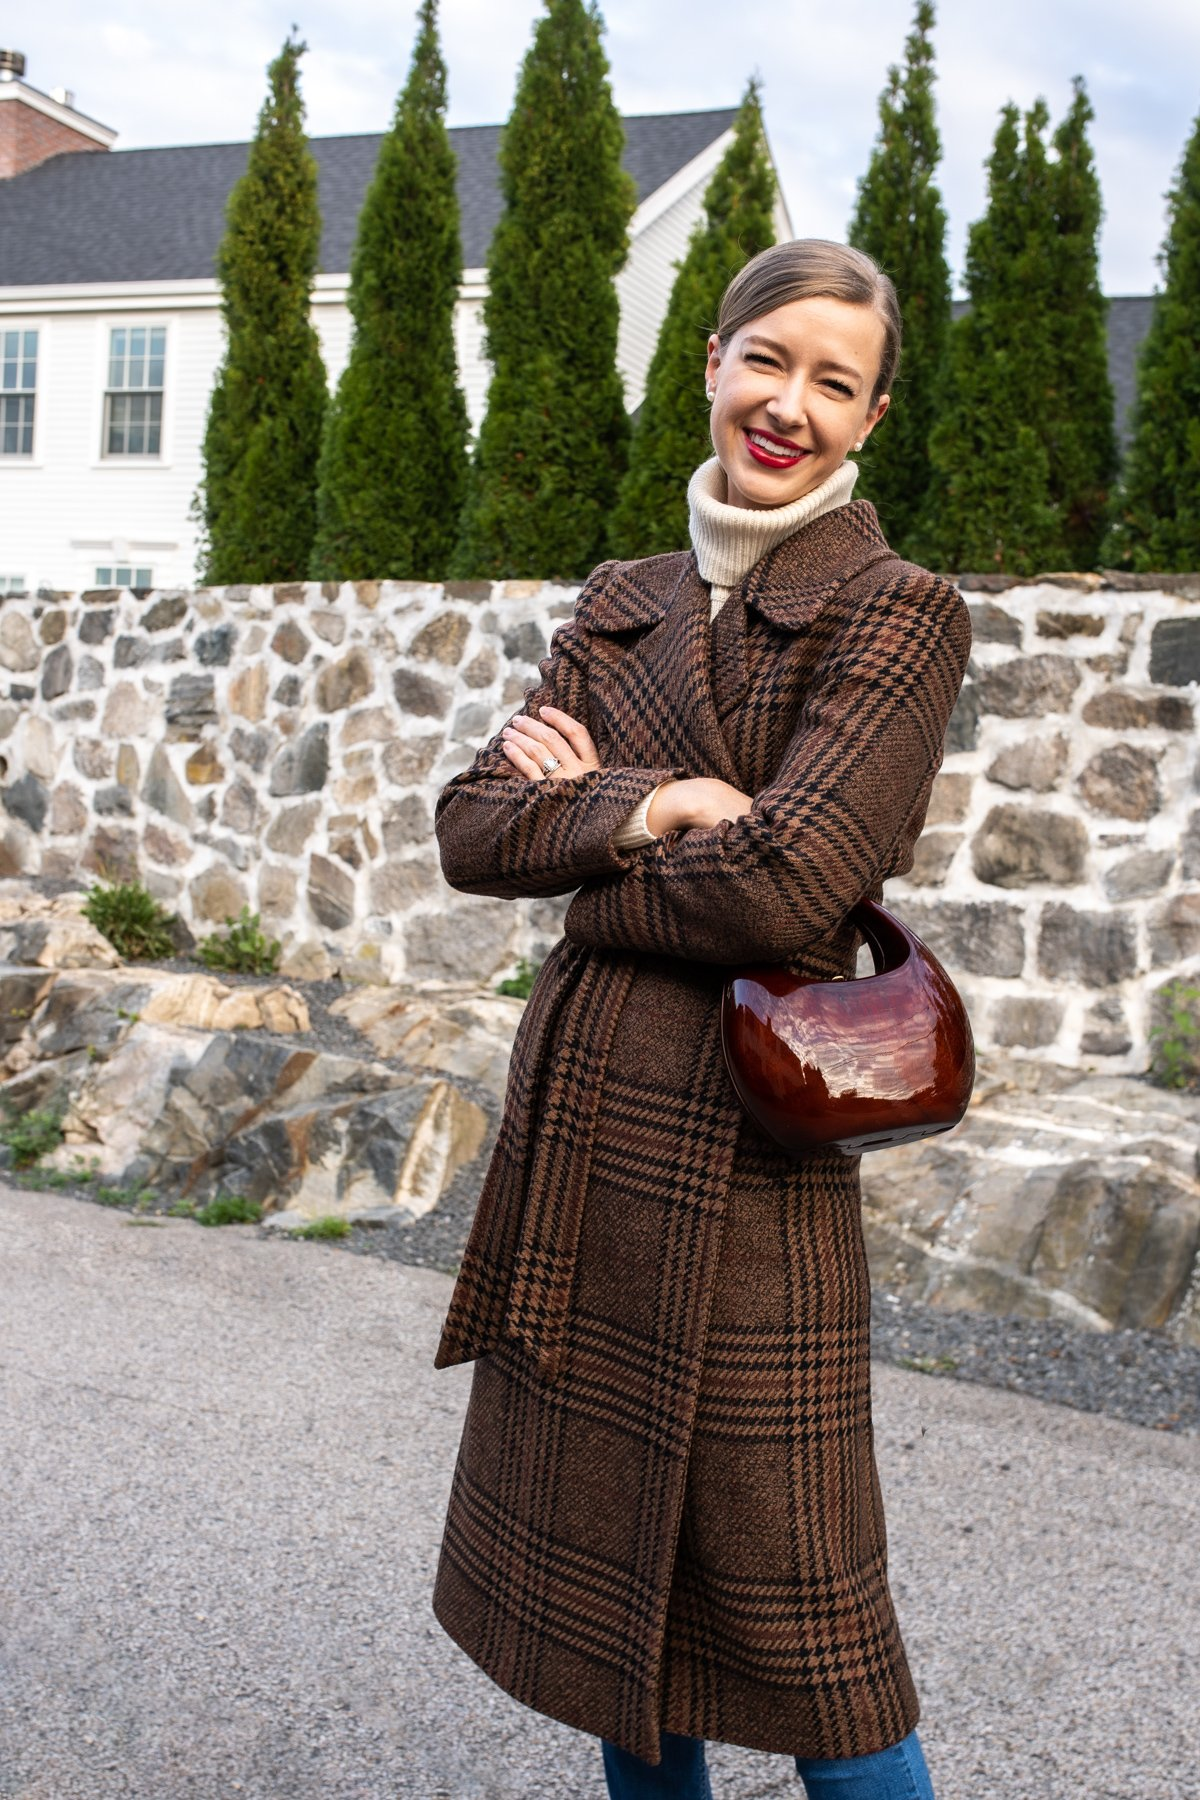 Stacie Flinner x Farfetch Plaid Wrap Coat-5.jpg